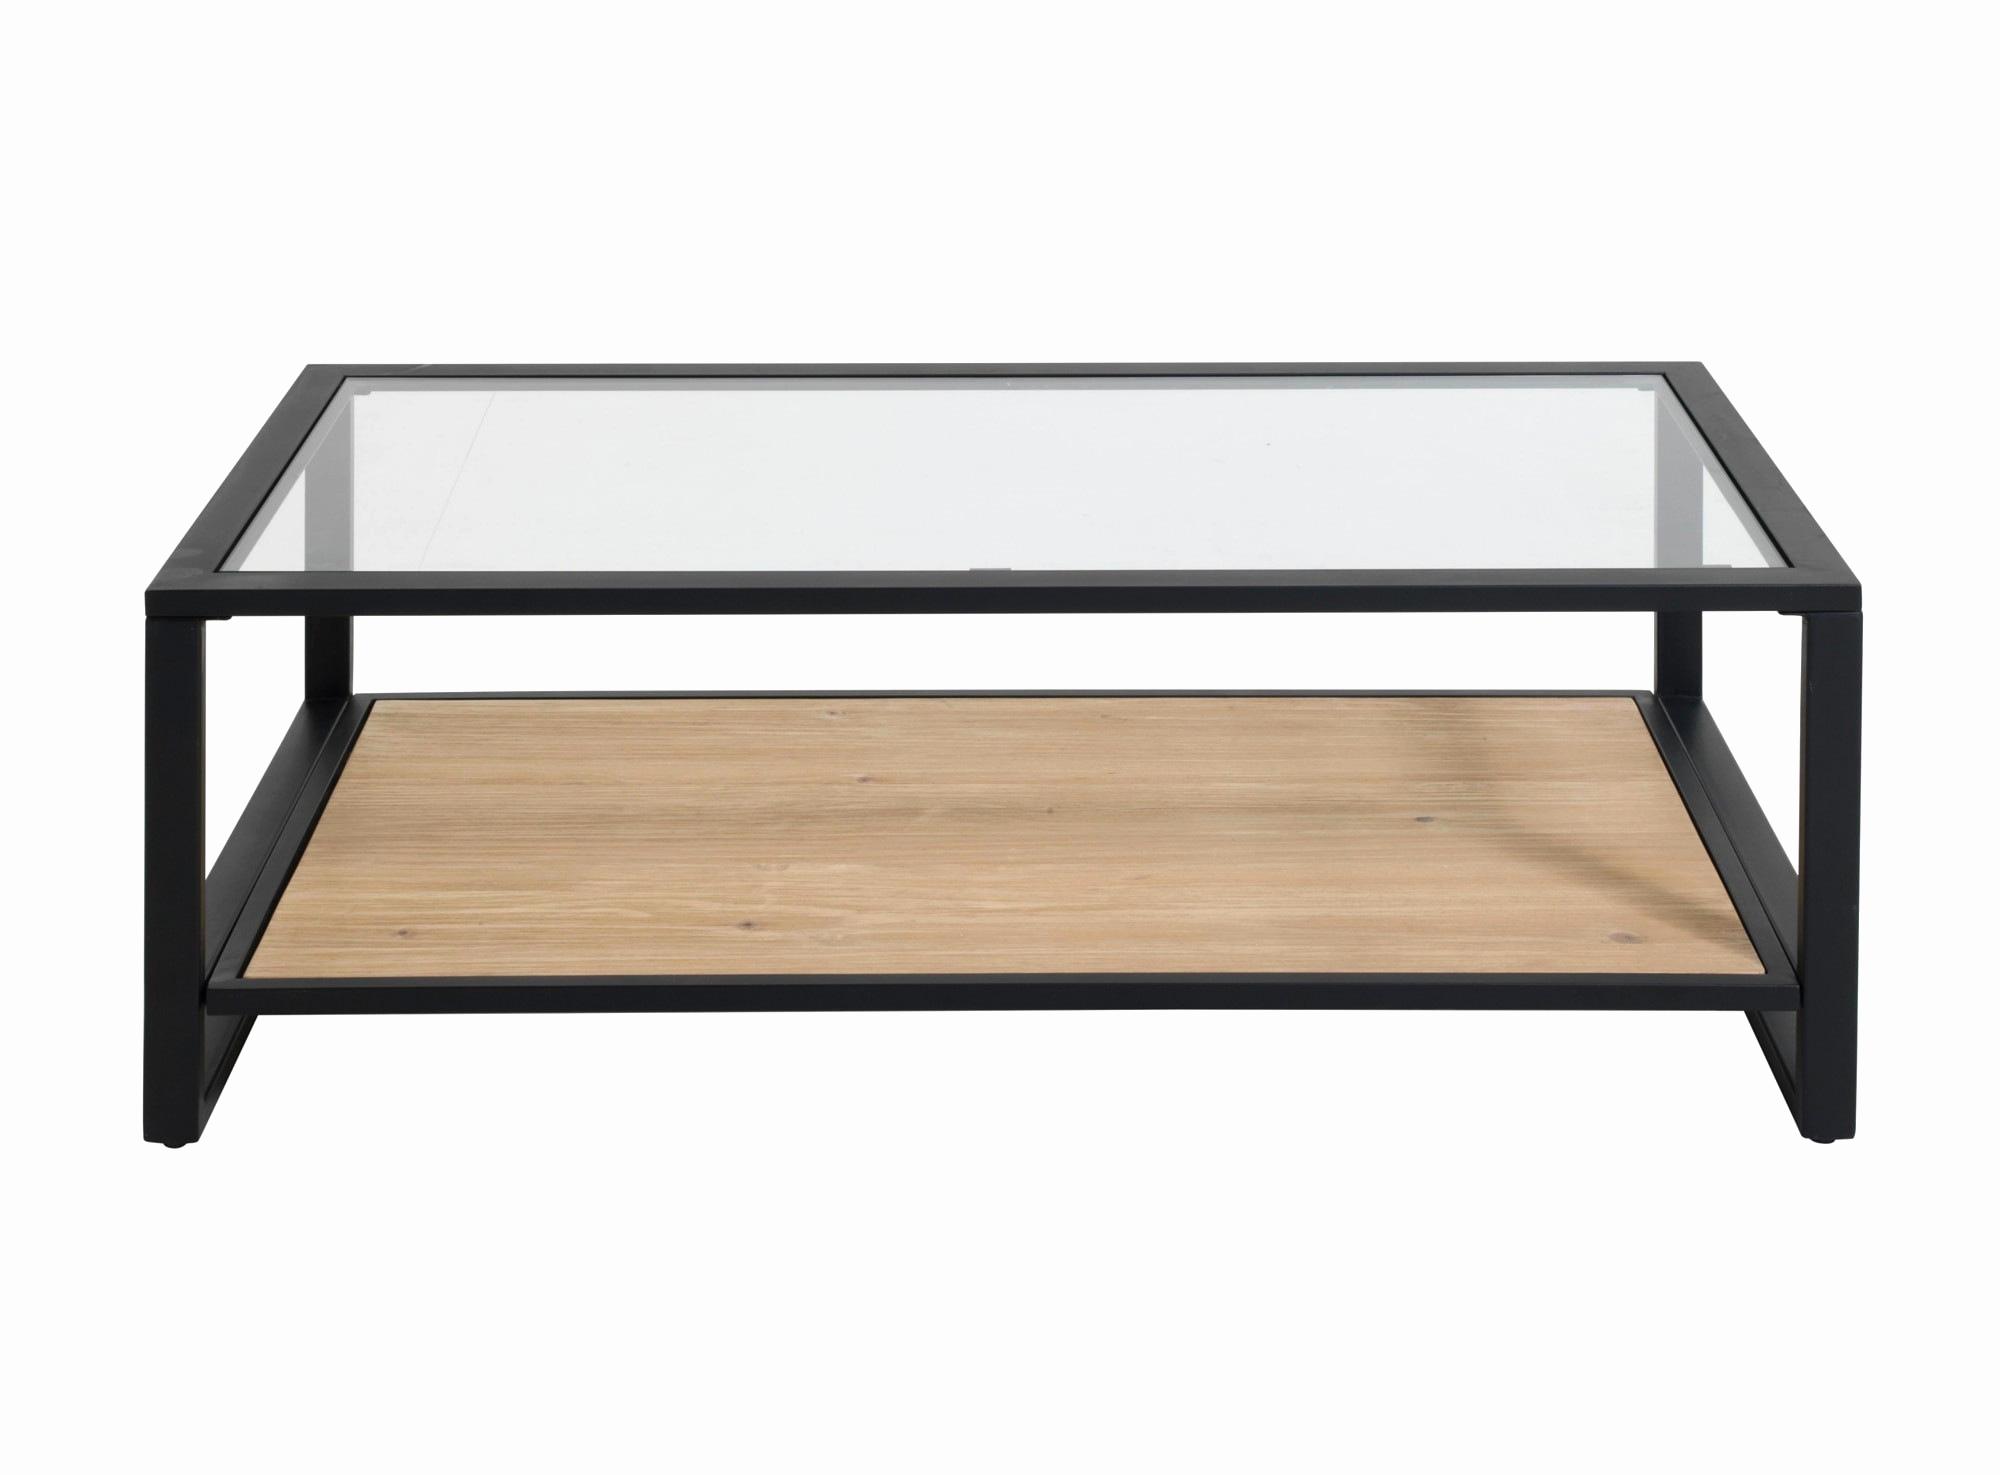 table basse ronde luxe. Black Bedroom Furniture Sets. Home Design Ideas